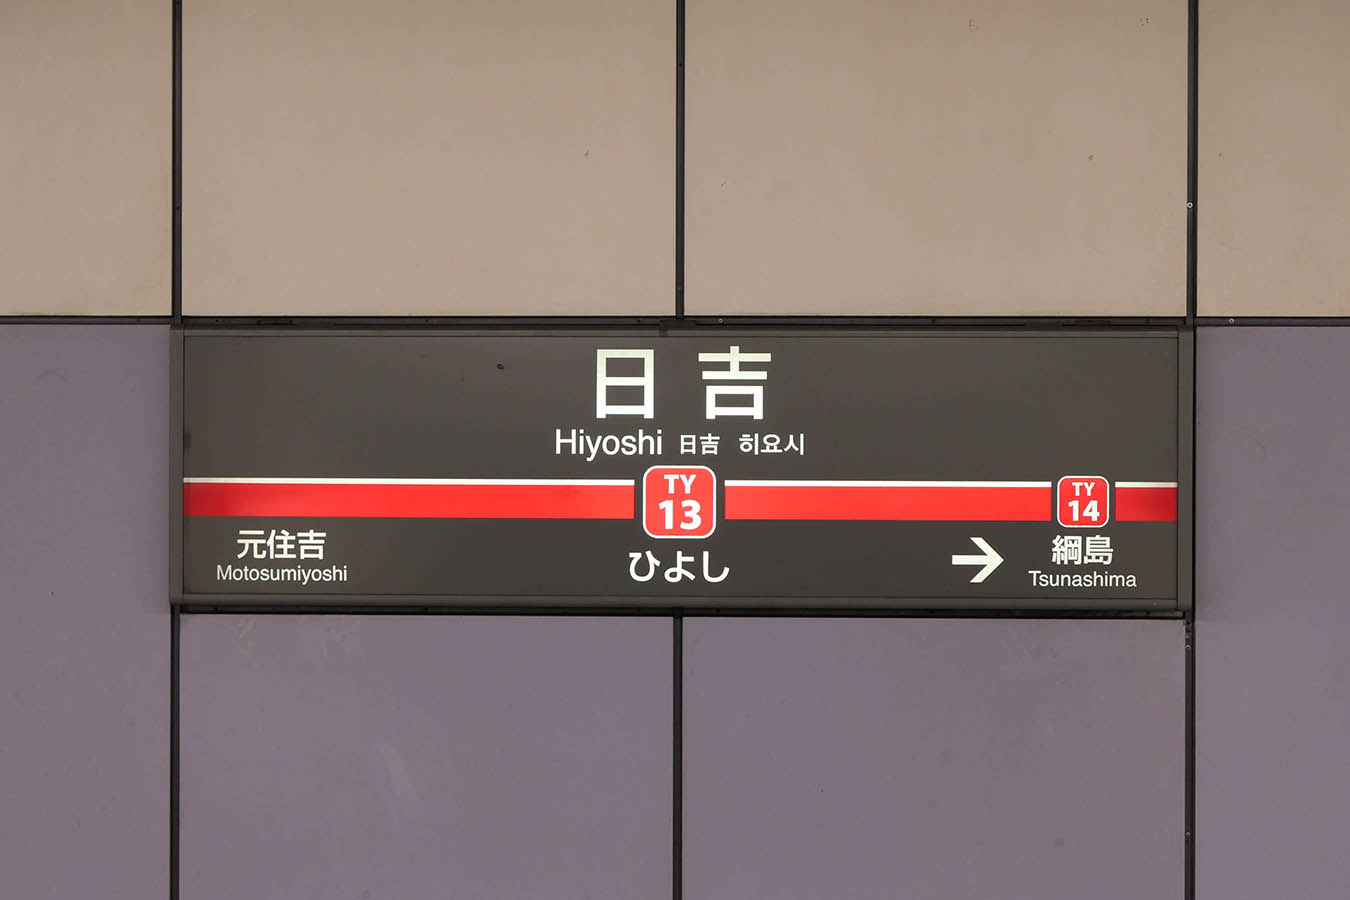 MG13_photo06.jpg